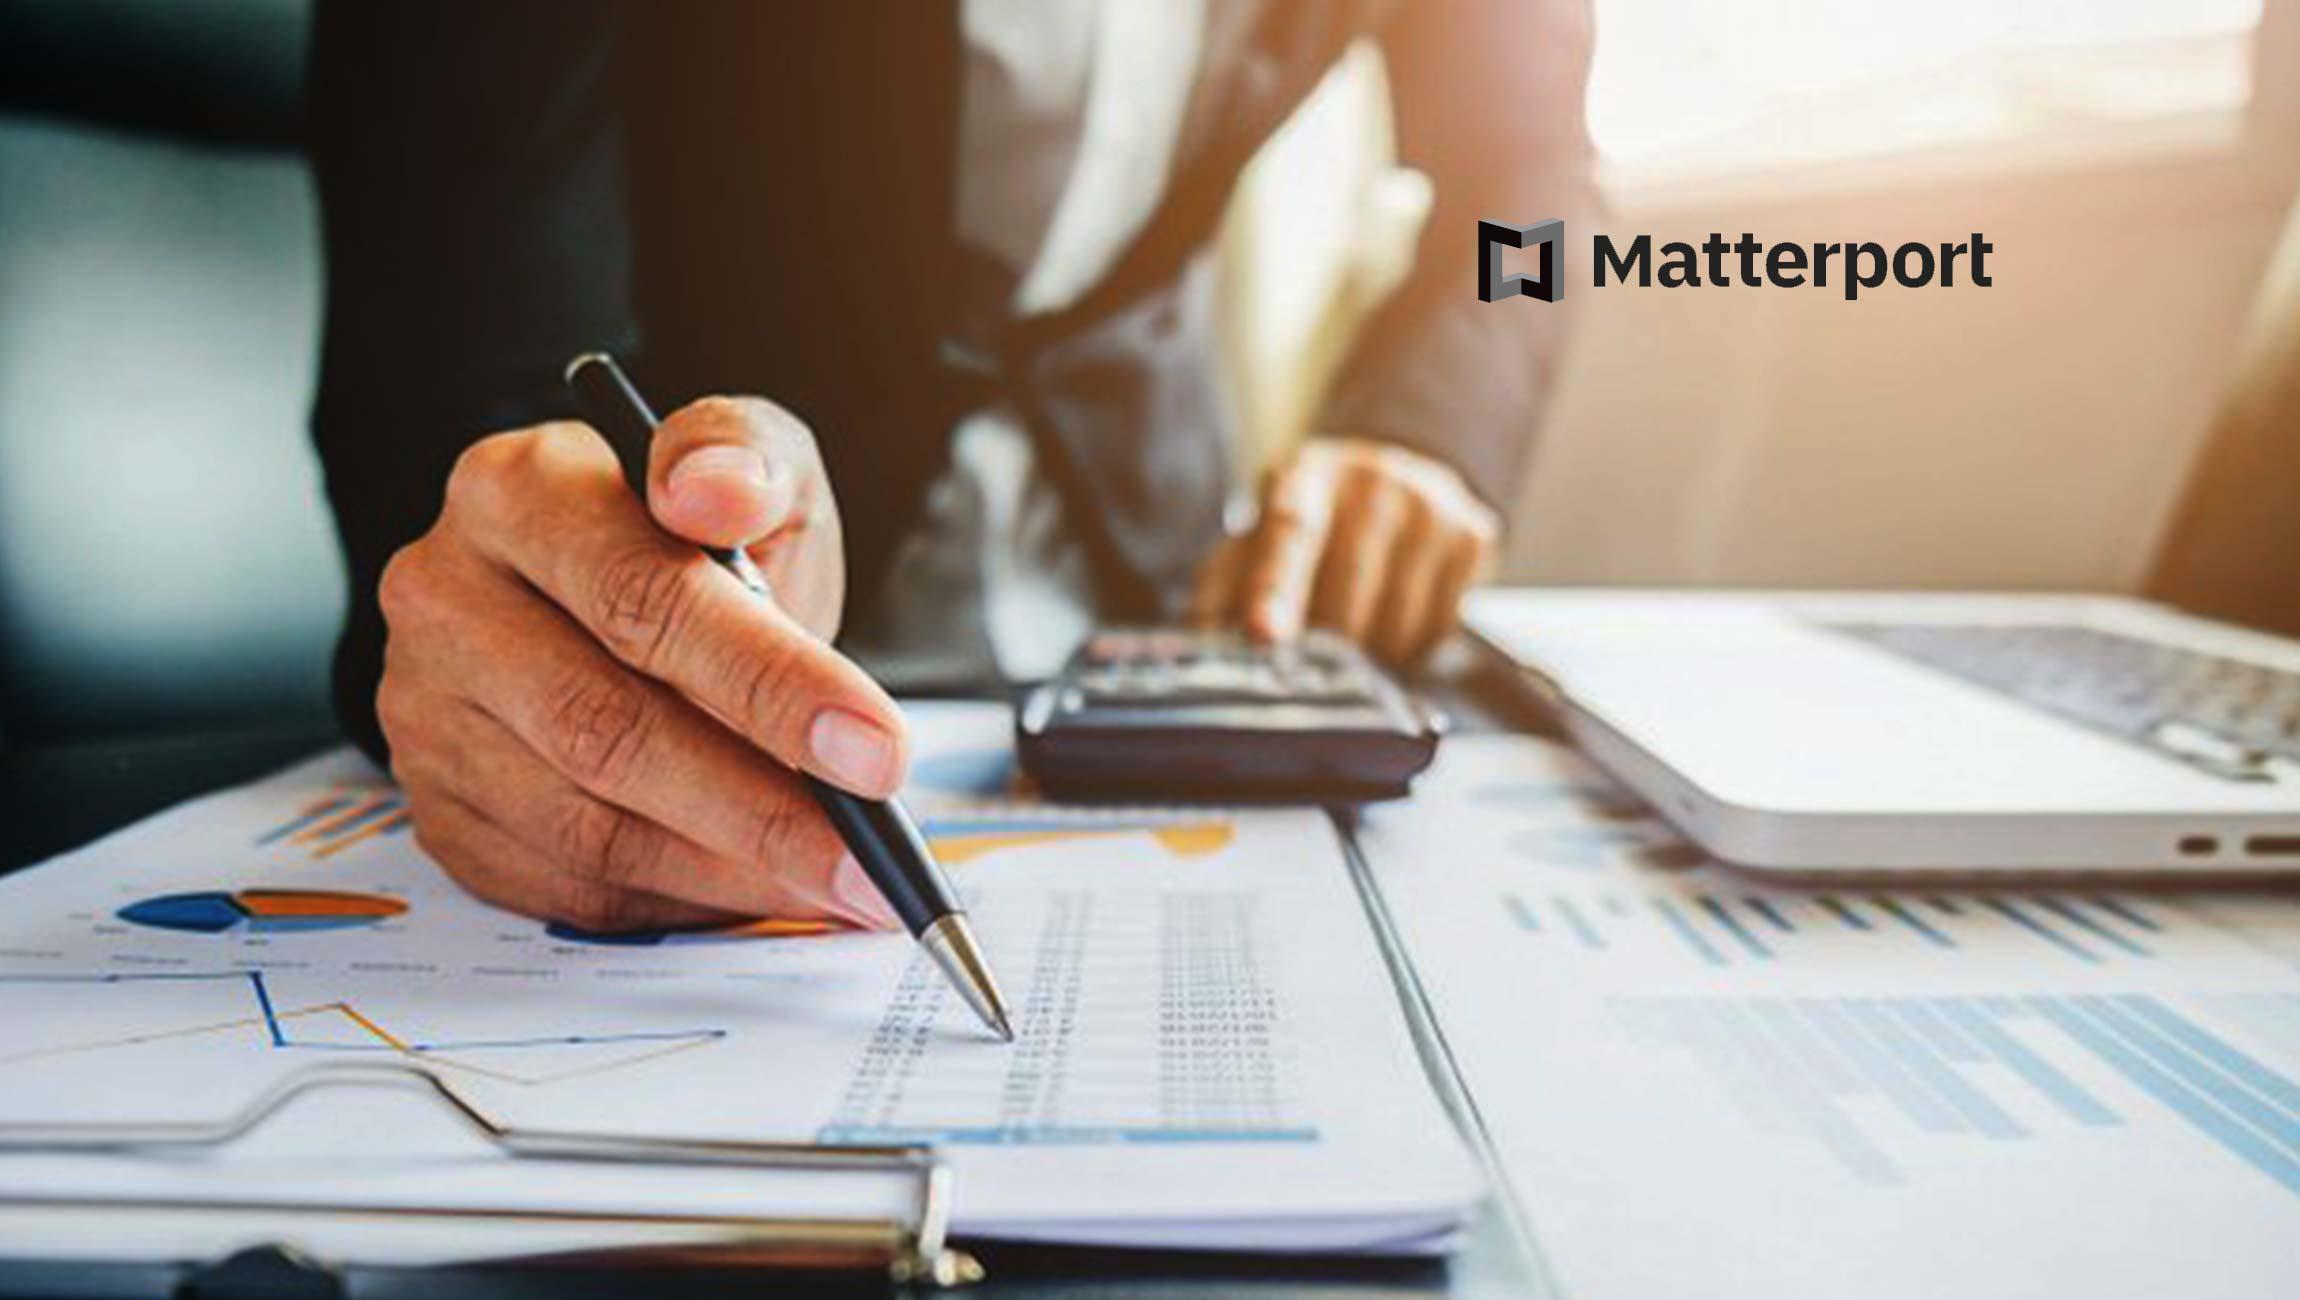 Matterport Welcomes Vinatha Kutagula as Vice President of Customer Operations 1